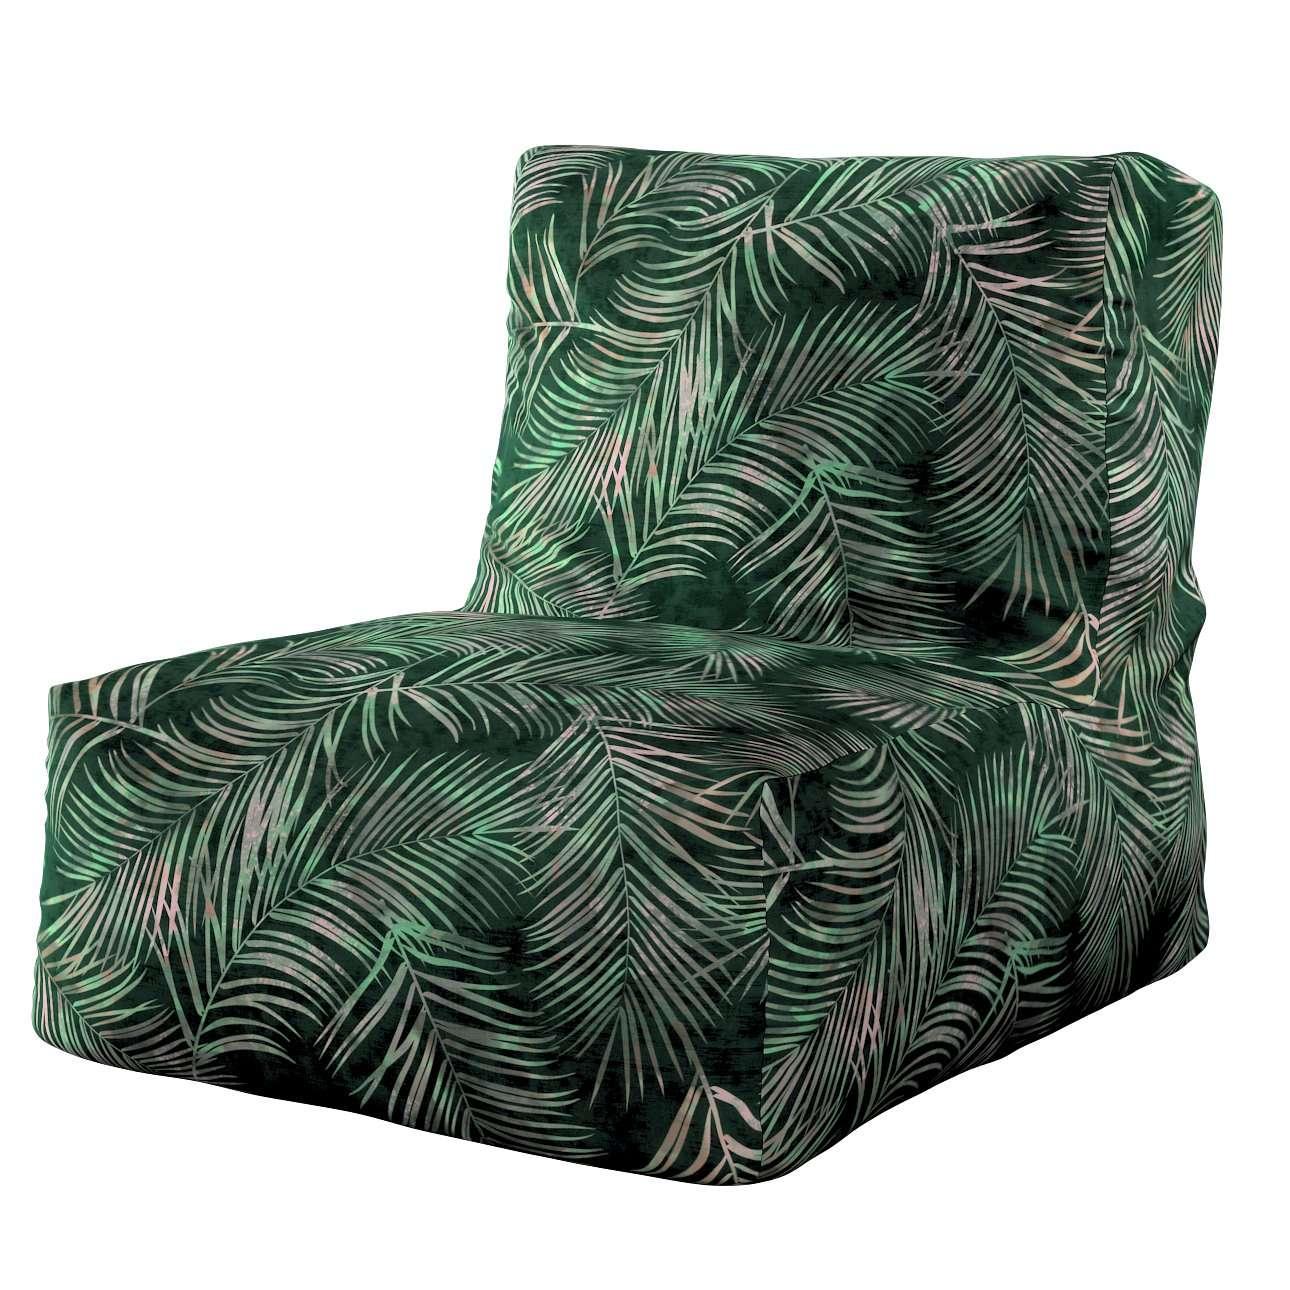 Pufa- fotel w kolekcji Velvet, tkanina: 704-21